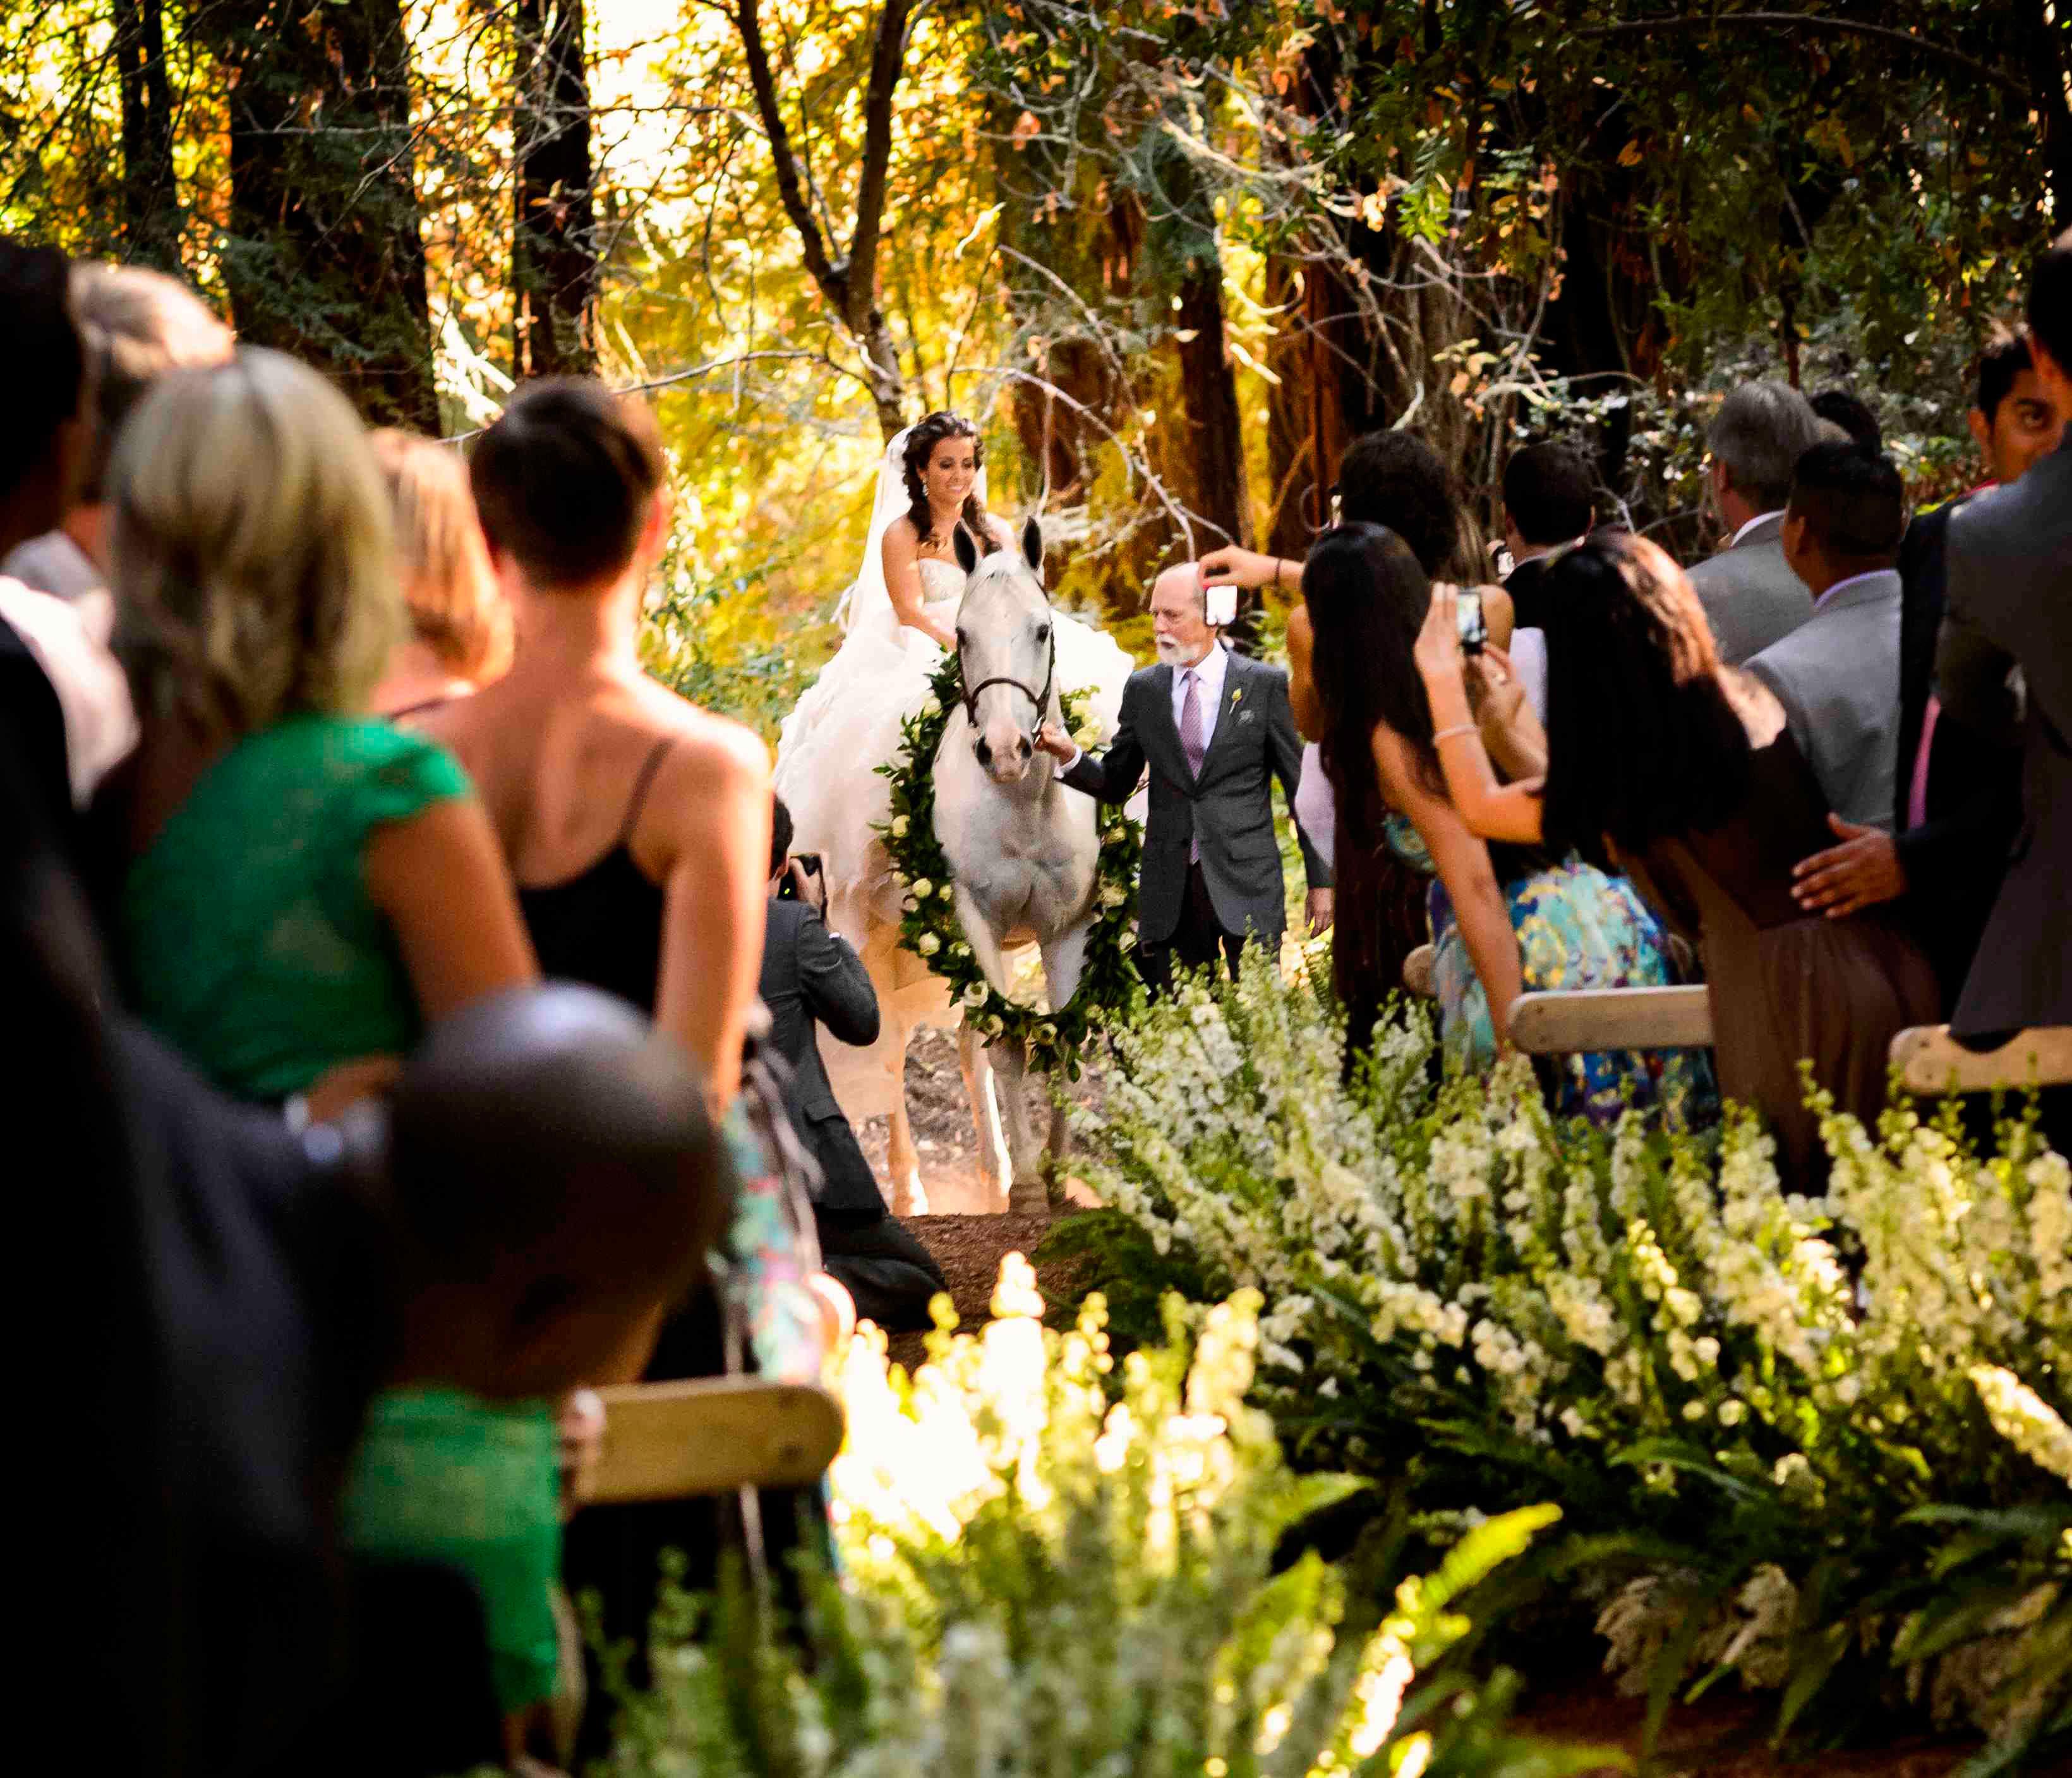 Bride escorted to ceremony on horseback